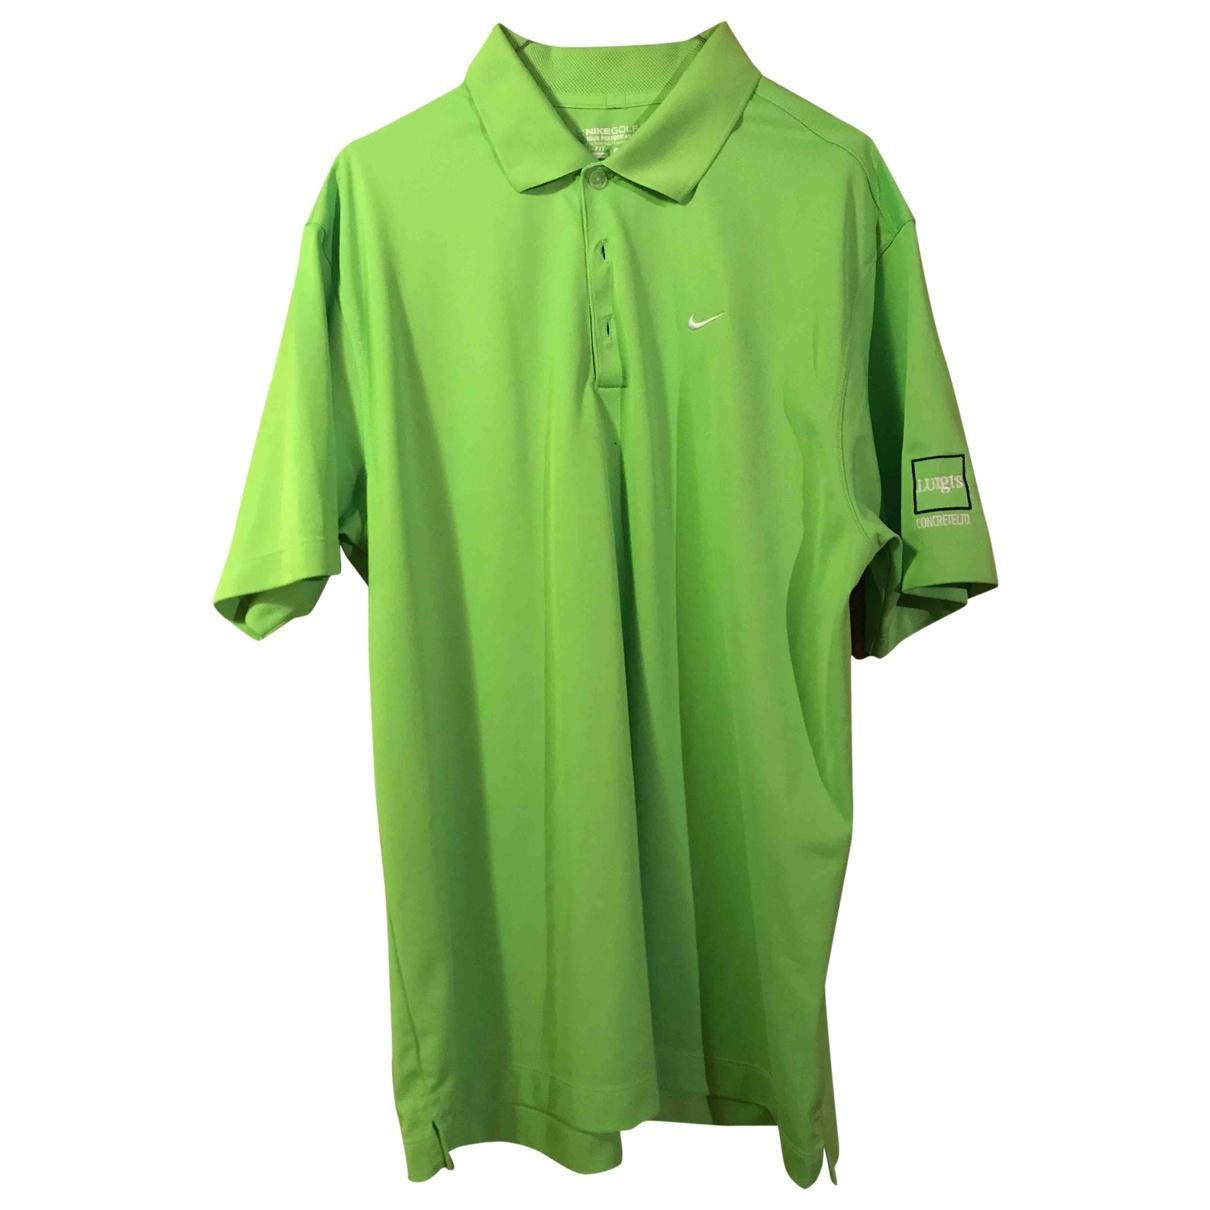 Nike \N Green Polo shirts for Men L International